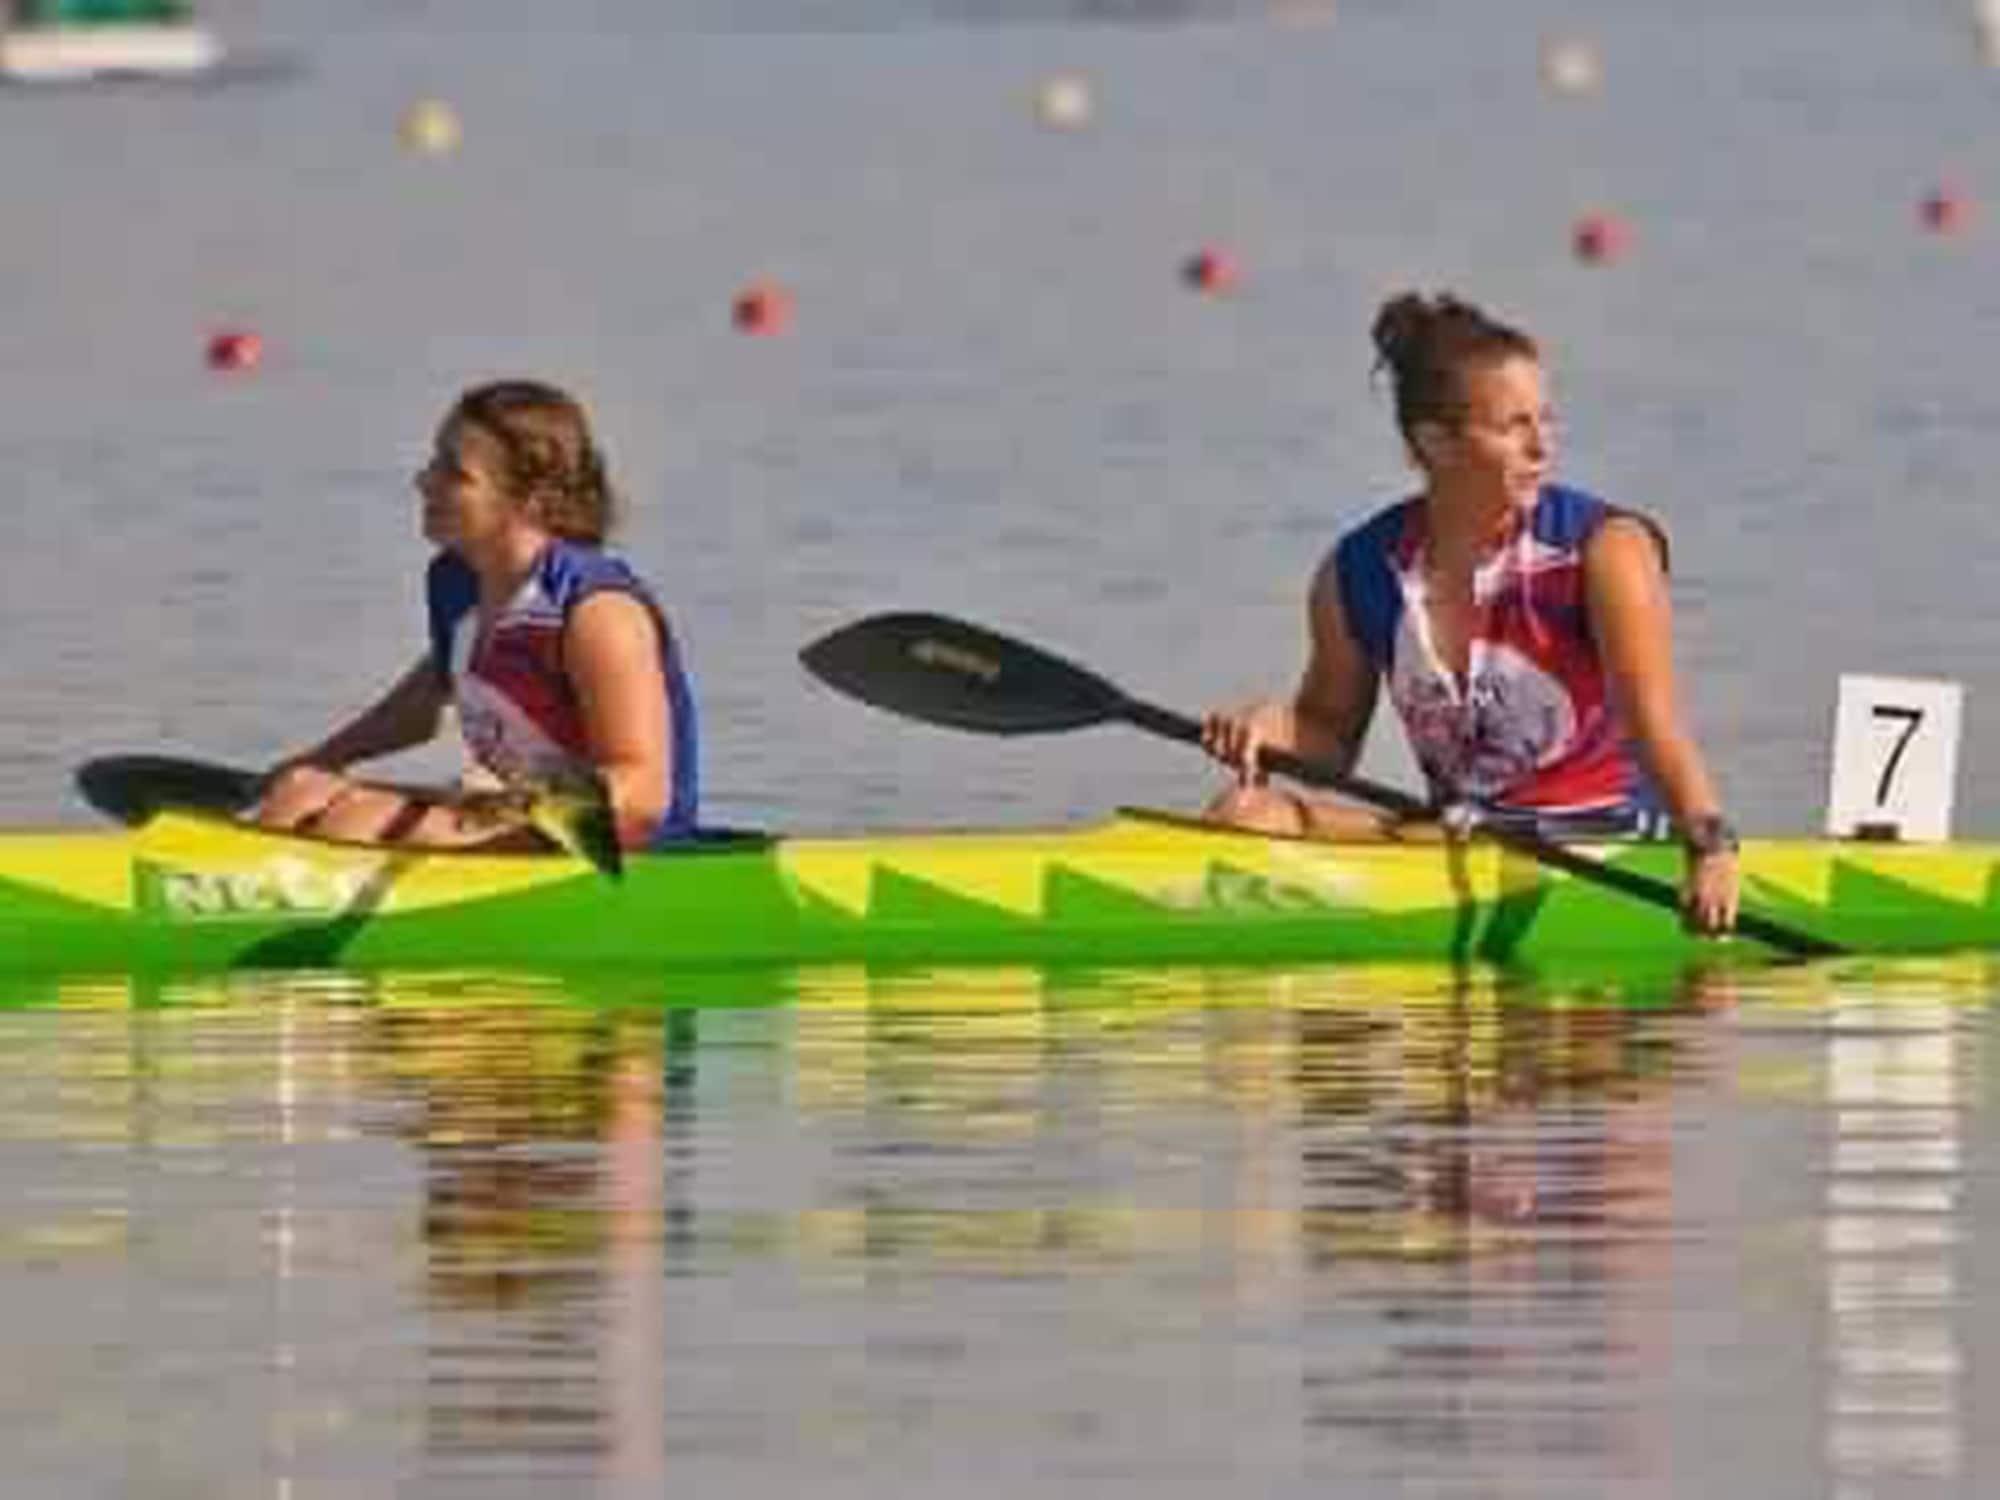 Two women sitting in a kayak.